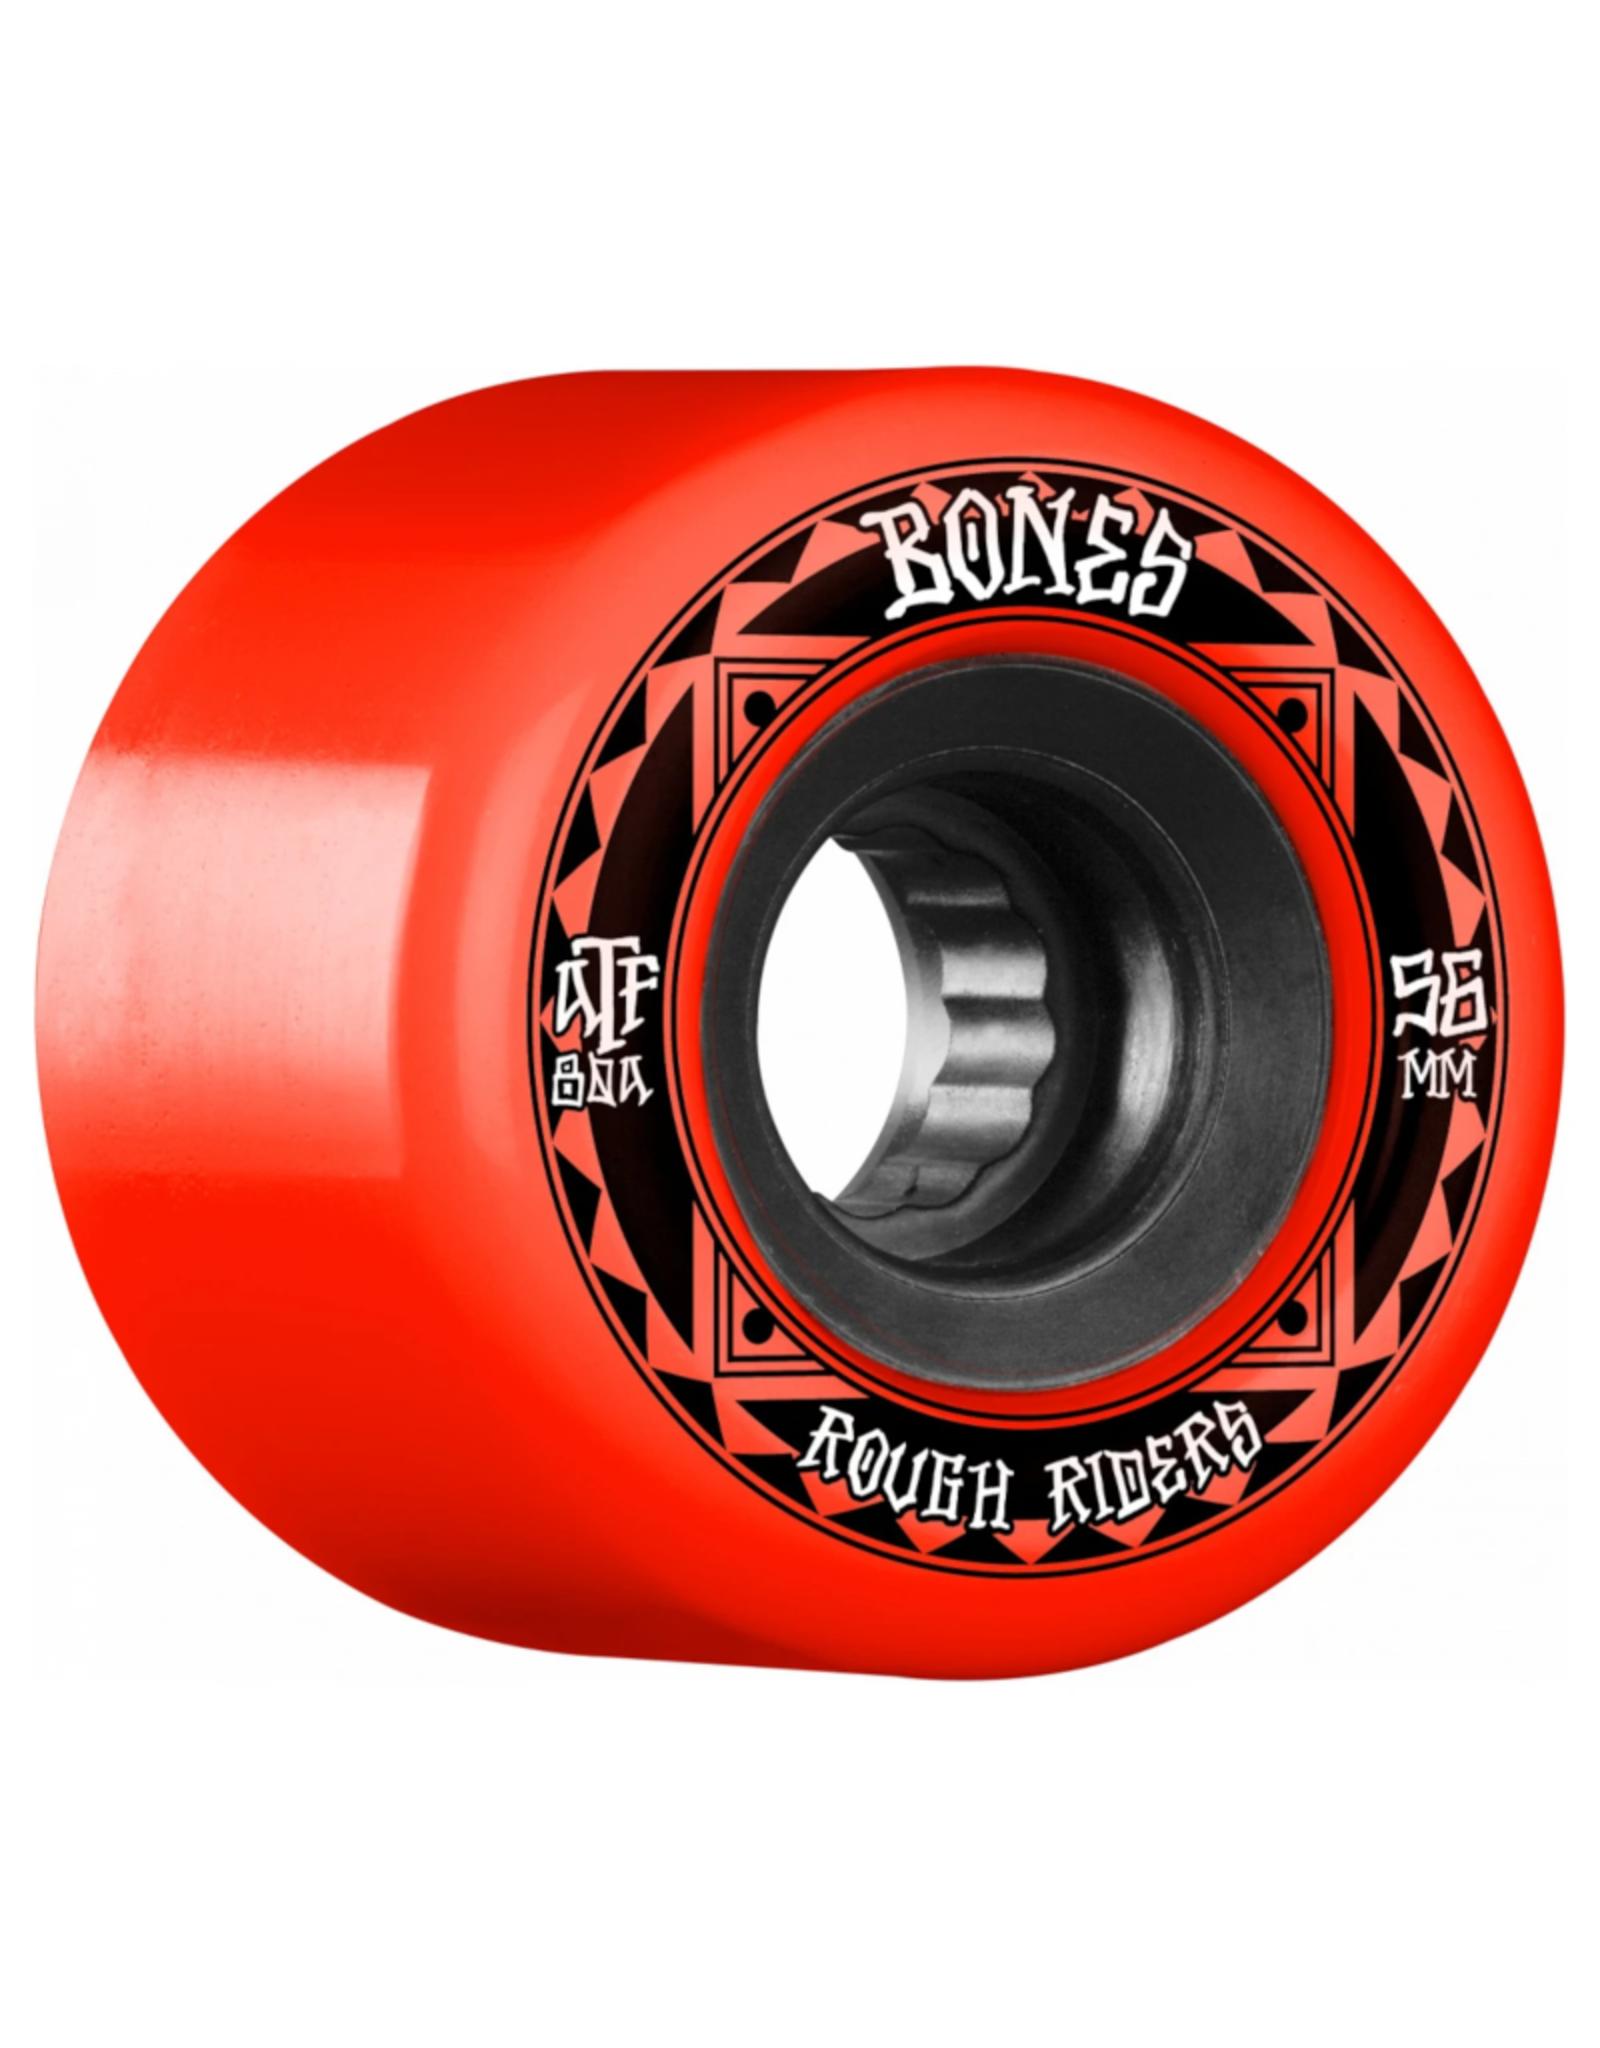 BONES BONES - ATF - ROUGH RIDERS - 80a - 56 & 59MM